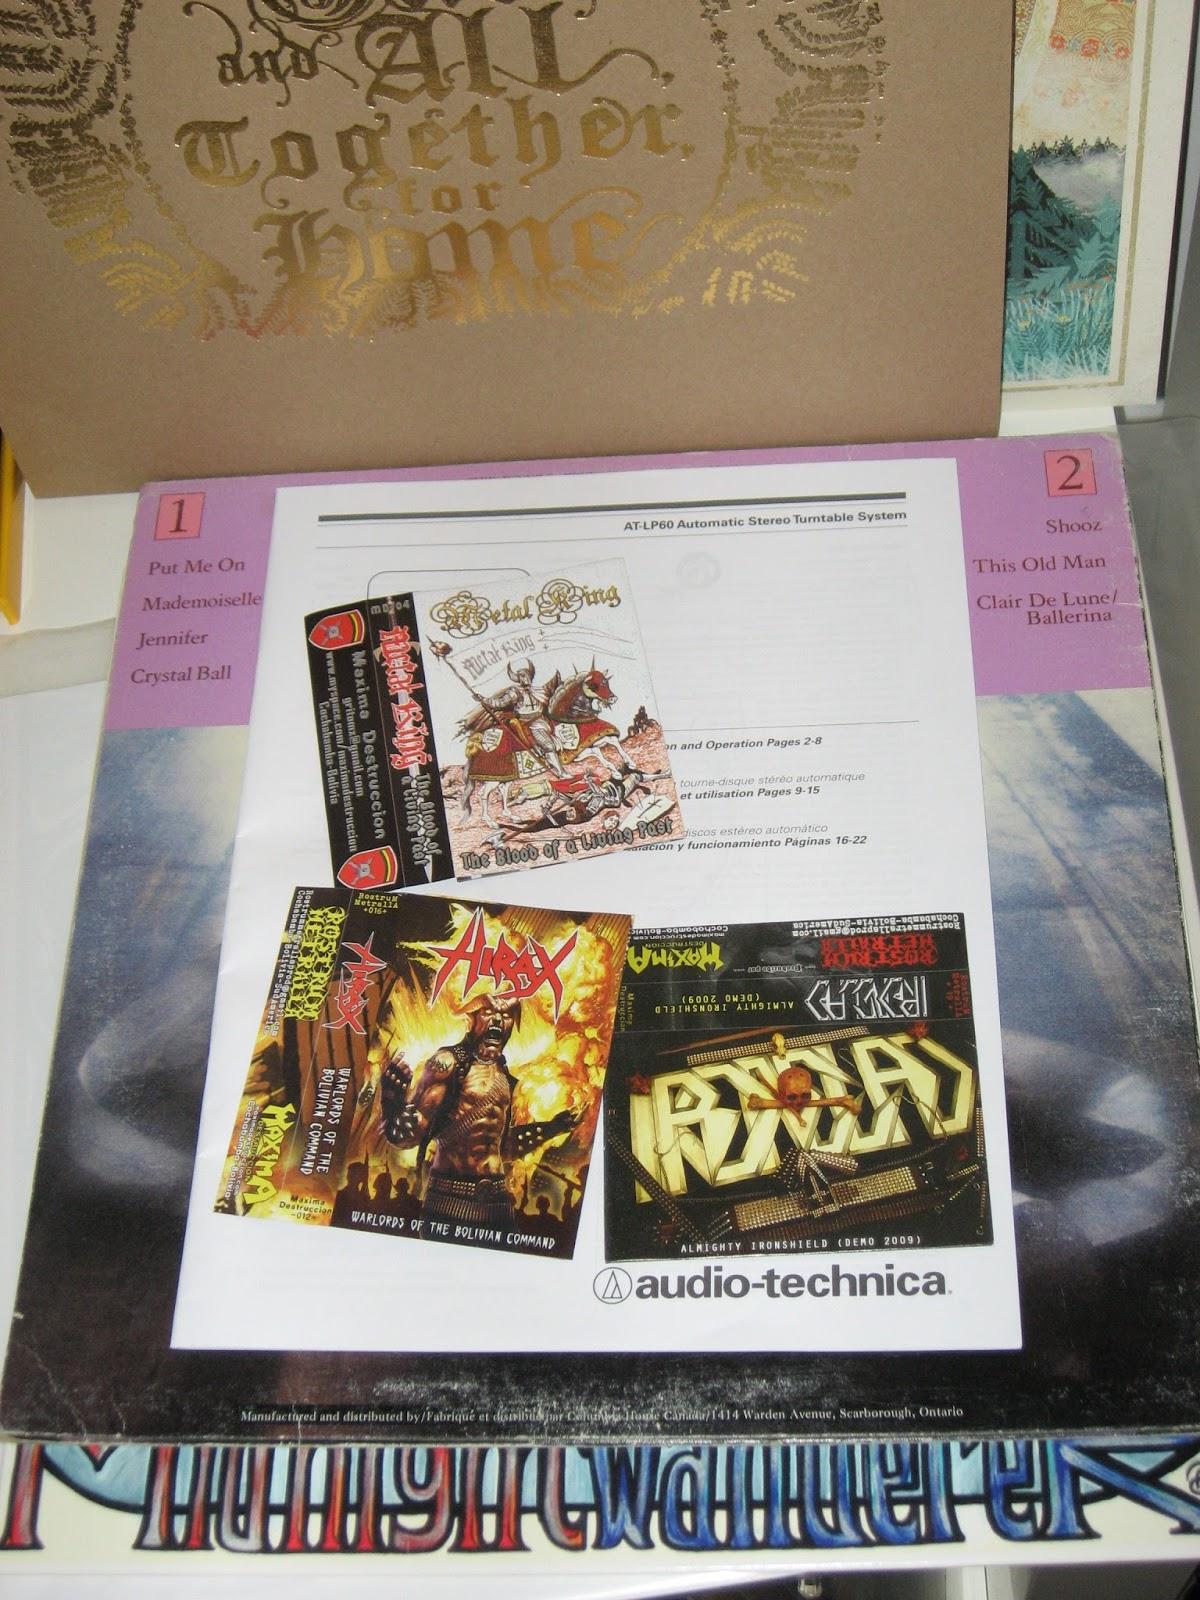 http://canadaspaceman.blogspot.ca/2015/07/cassettes.html